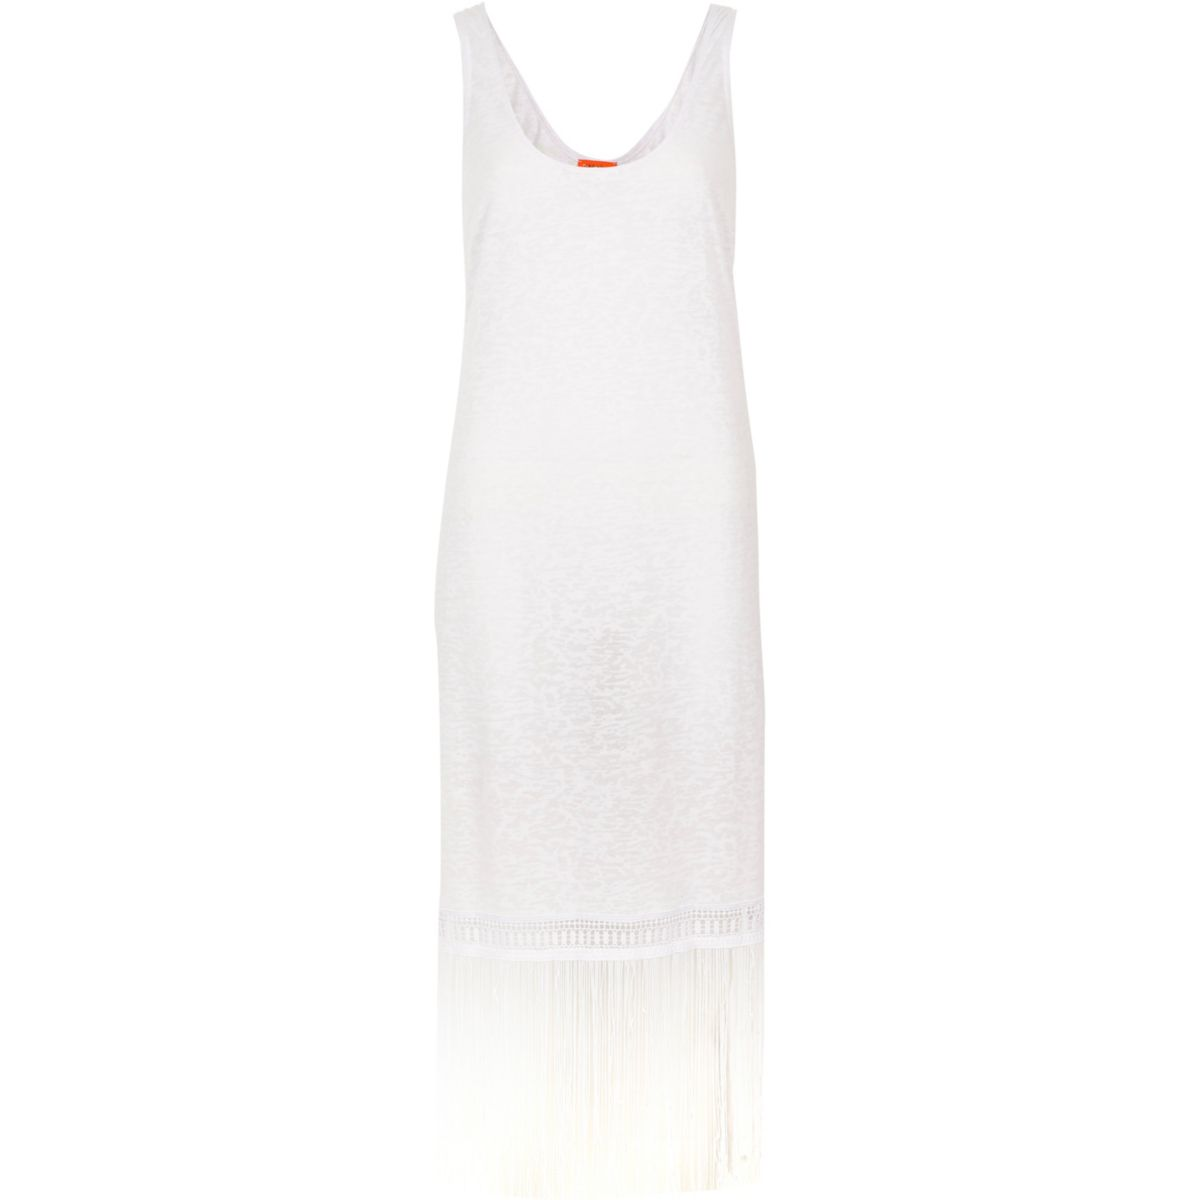 White burnout fringe trim tank dress